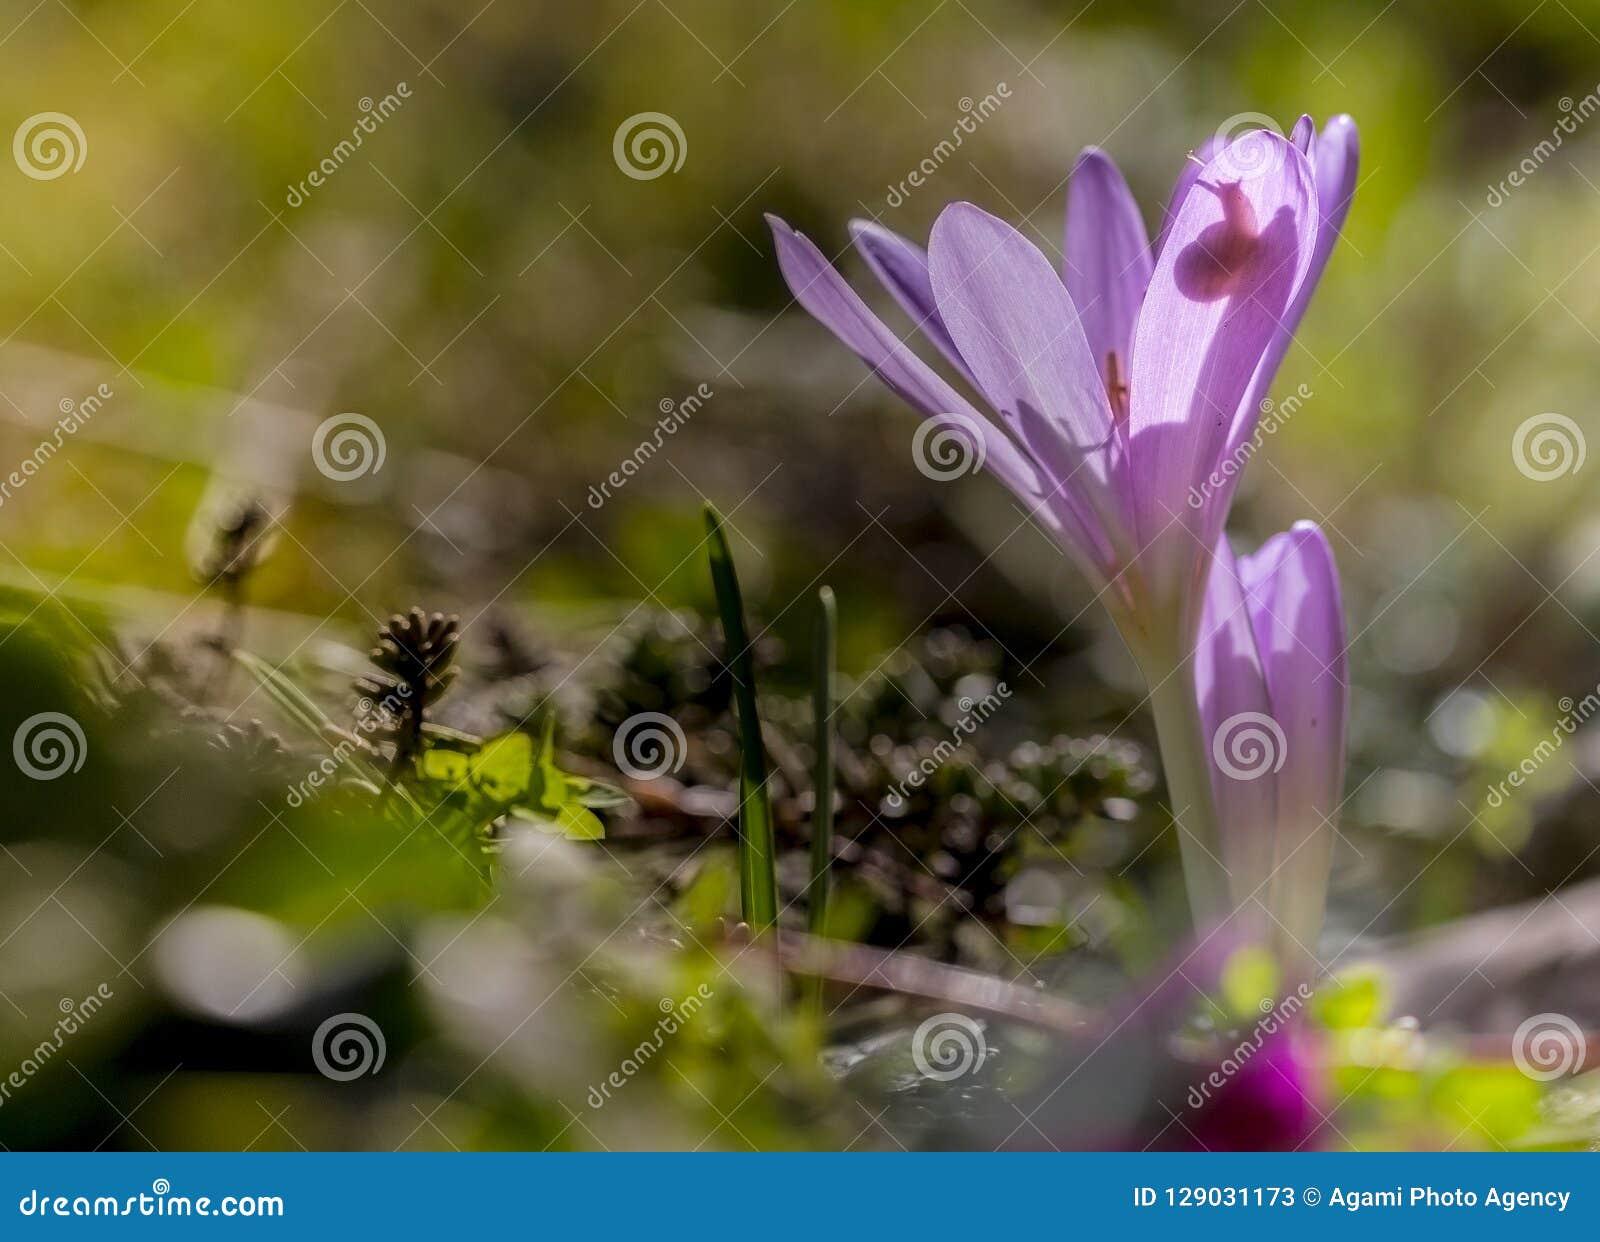 Herfsttijloos, zafferano di prato, colchicum autumnale